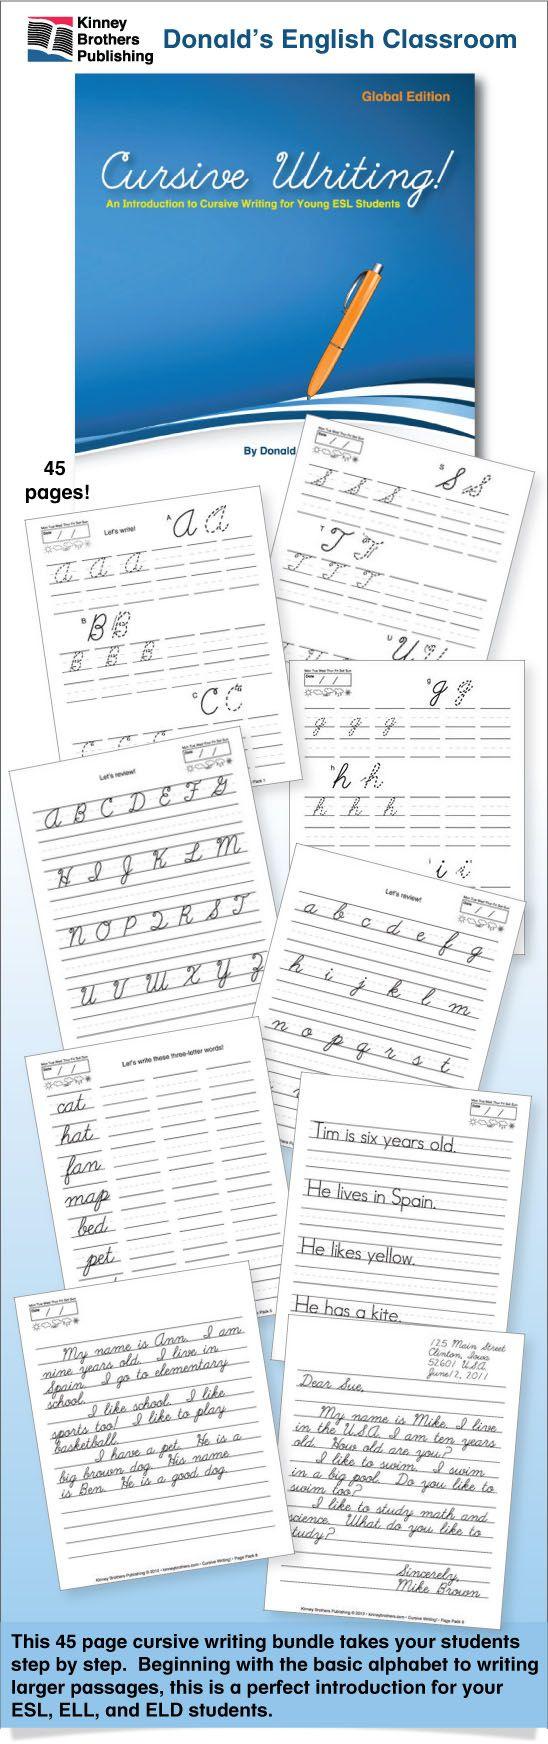 esl cursive writing full textbook teacher esl cursive writing teaching cursive. Black Bedroom Furniture Sets. Home Design Ideas